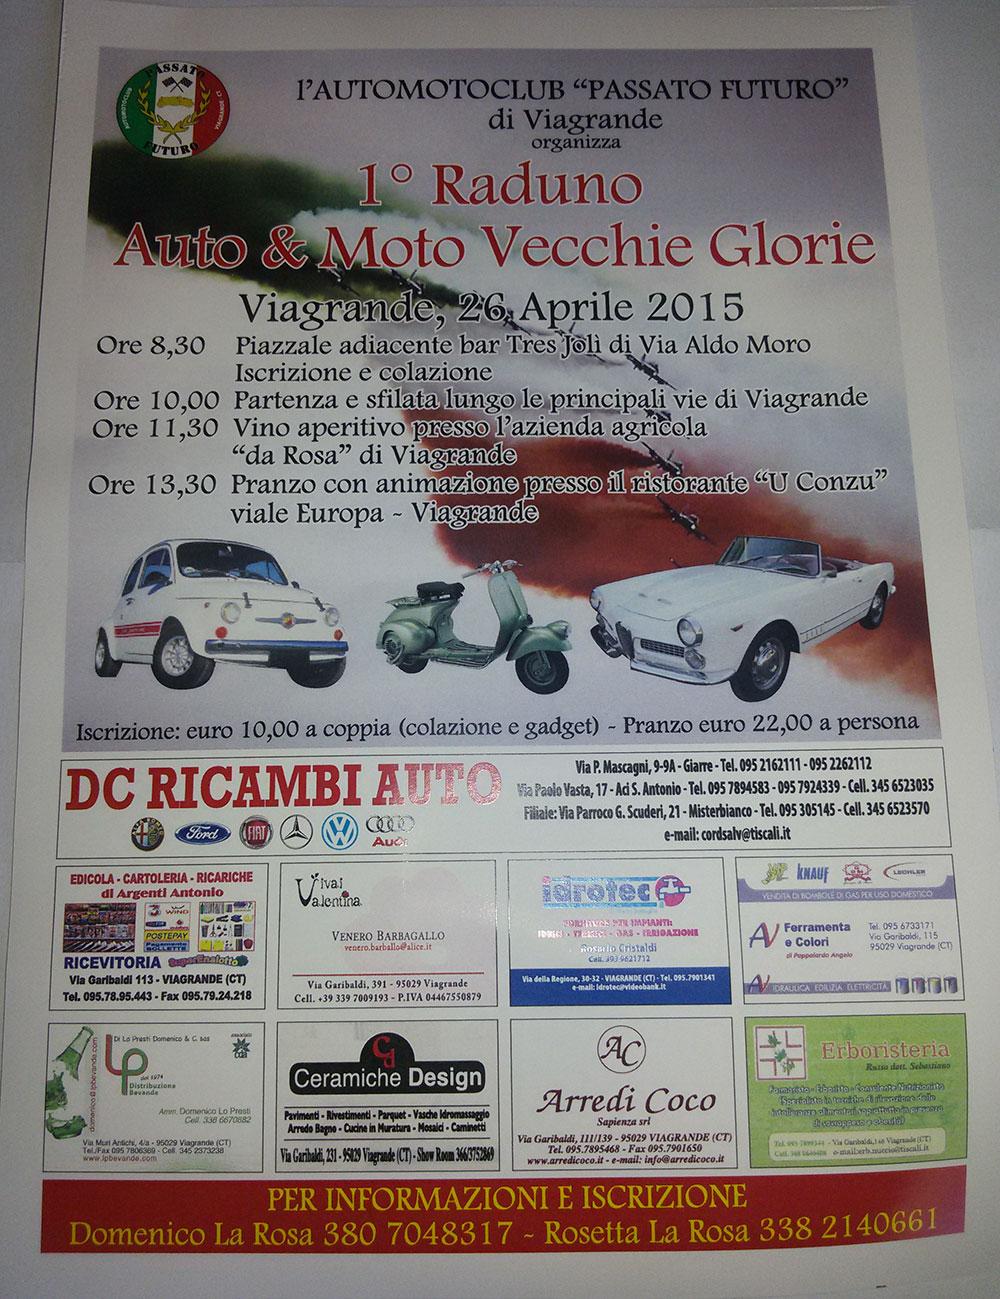 1° Raduno Auto & Moto Vecchie Glorie